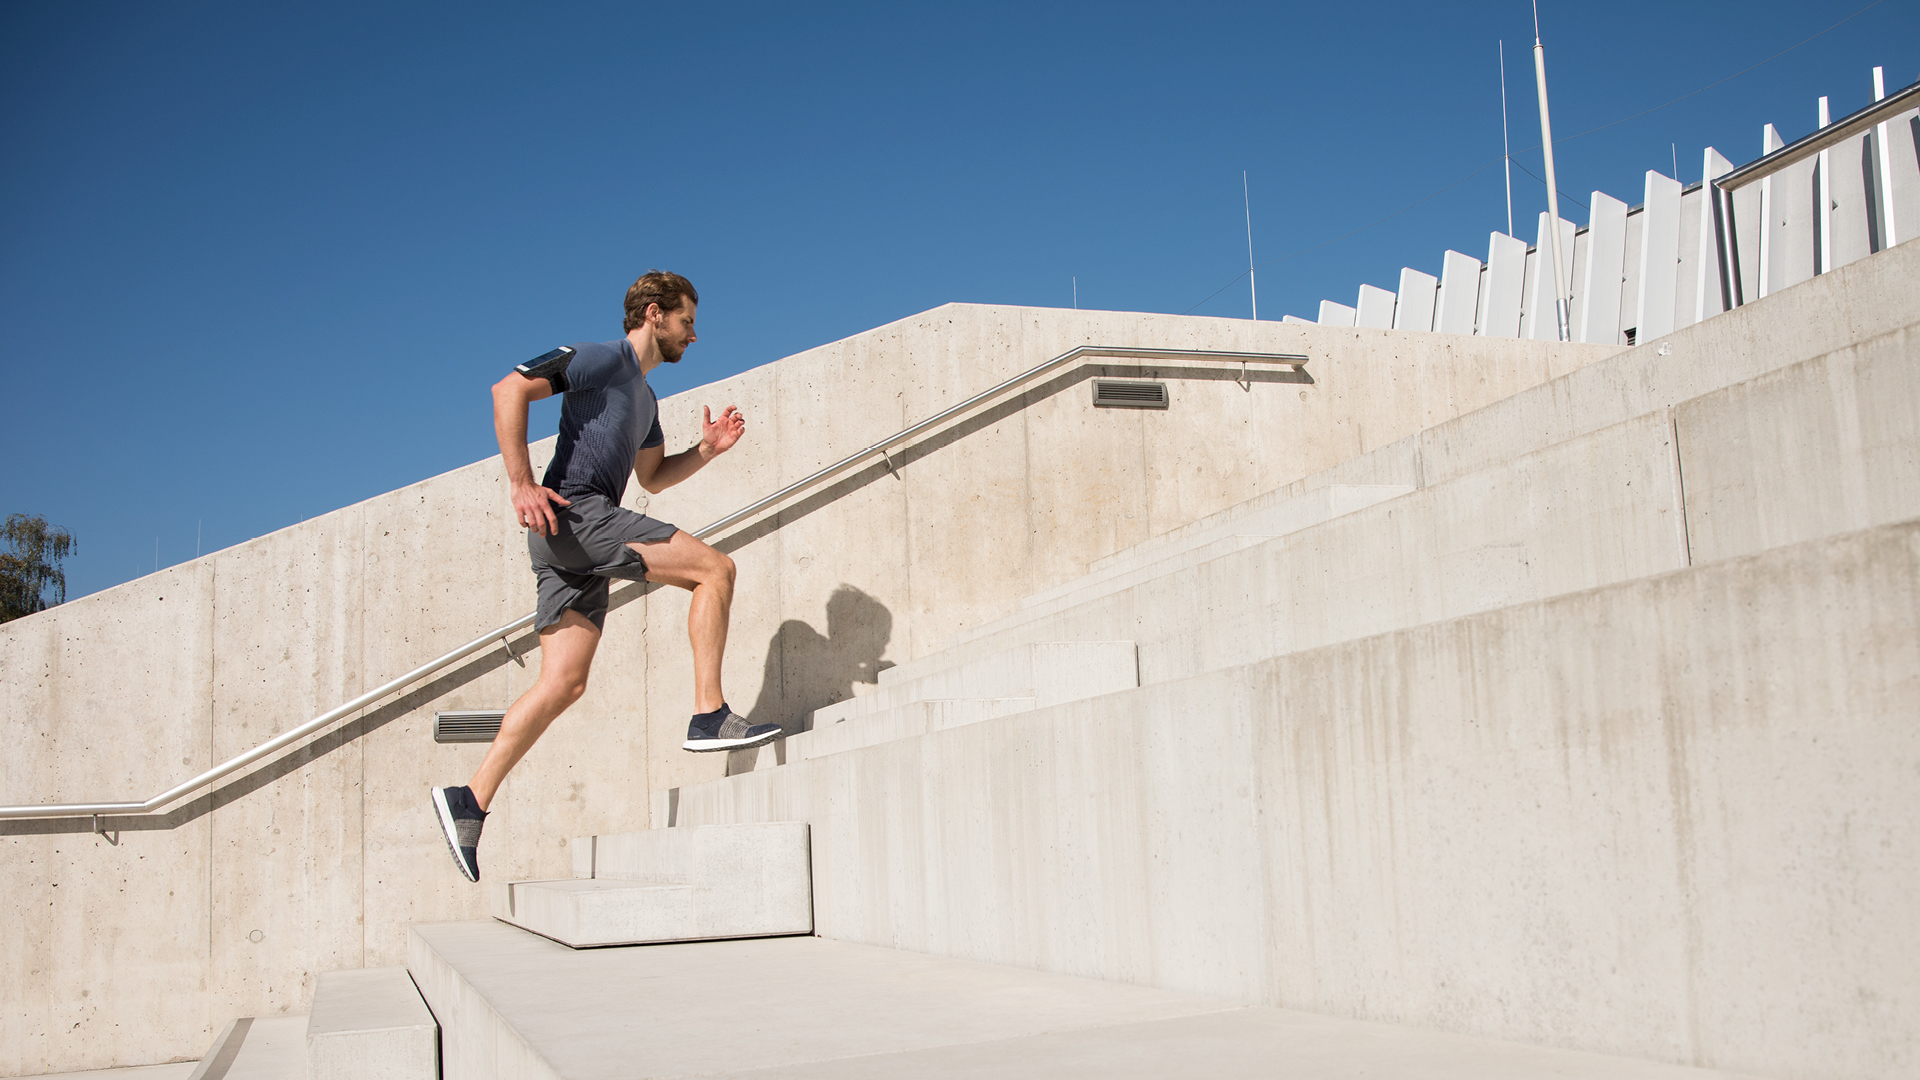 Adidas sport_Slider_ 1920x1080 px